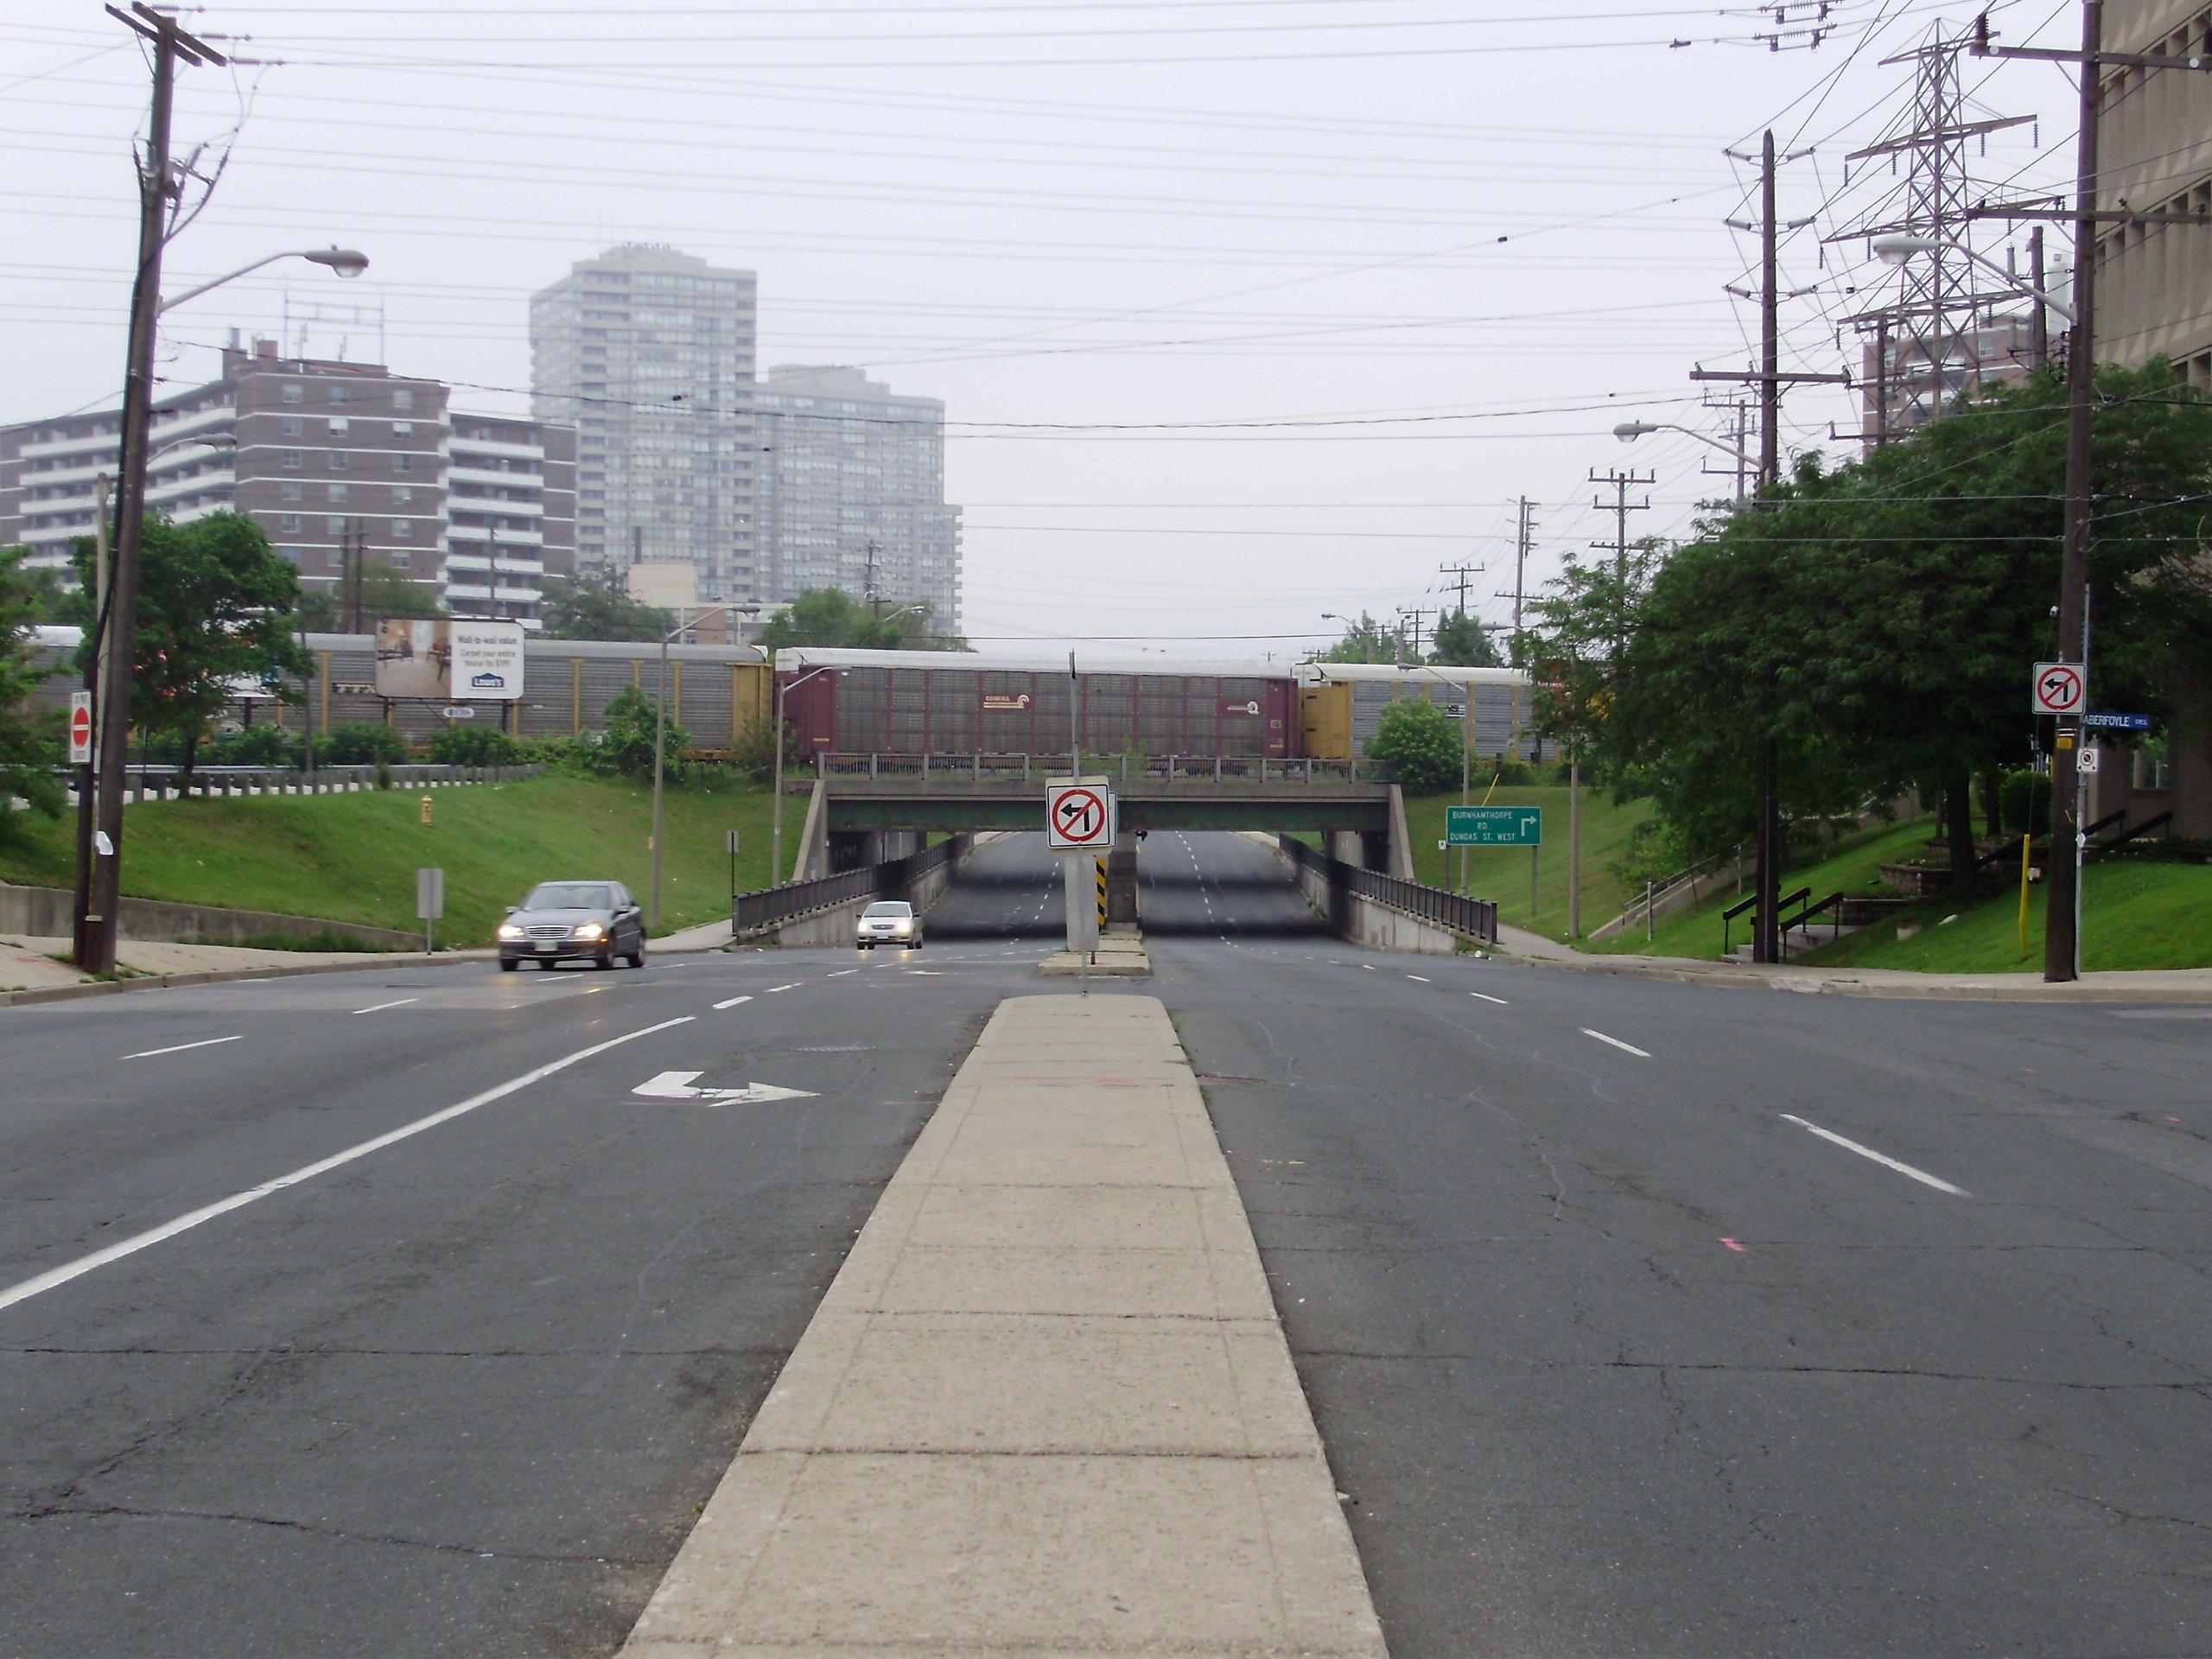 Region York North Escort Toronto 401 Dvp And